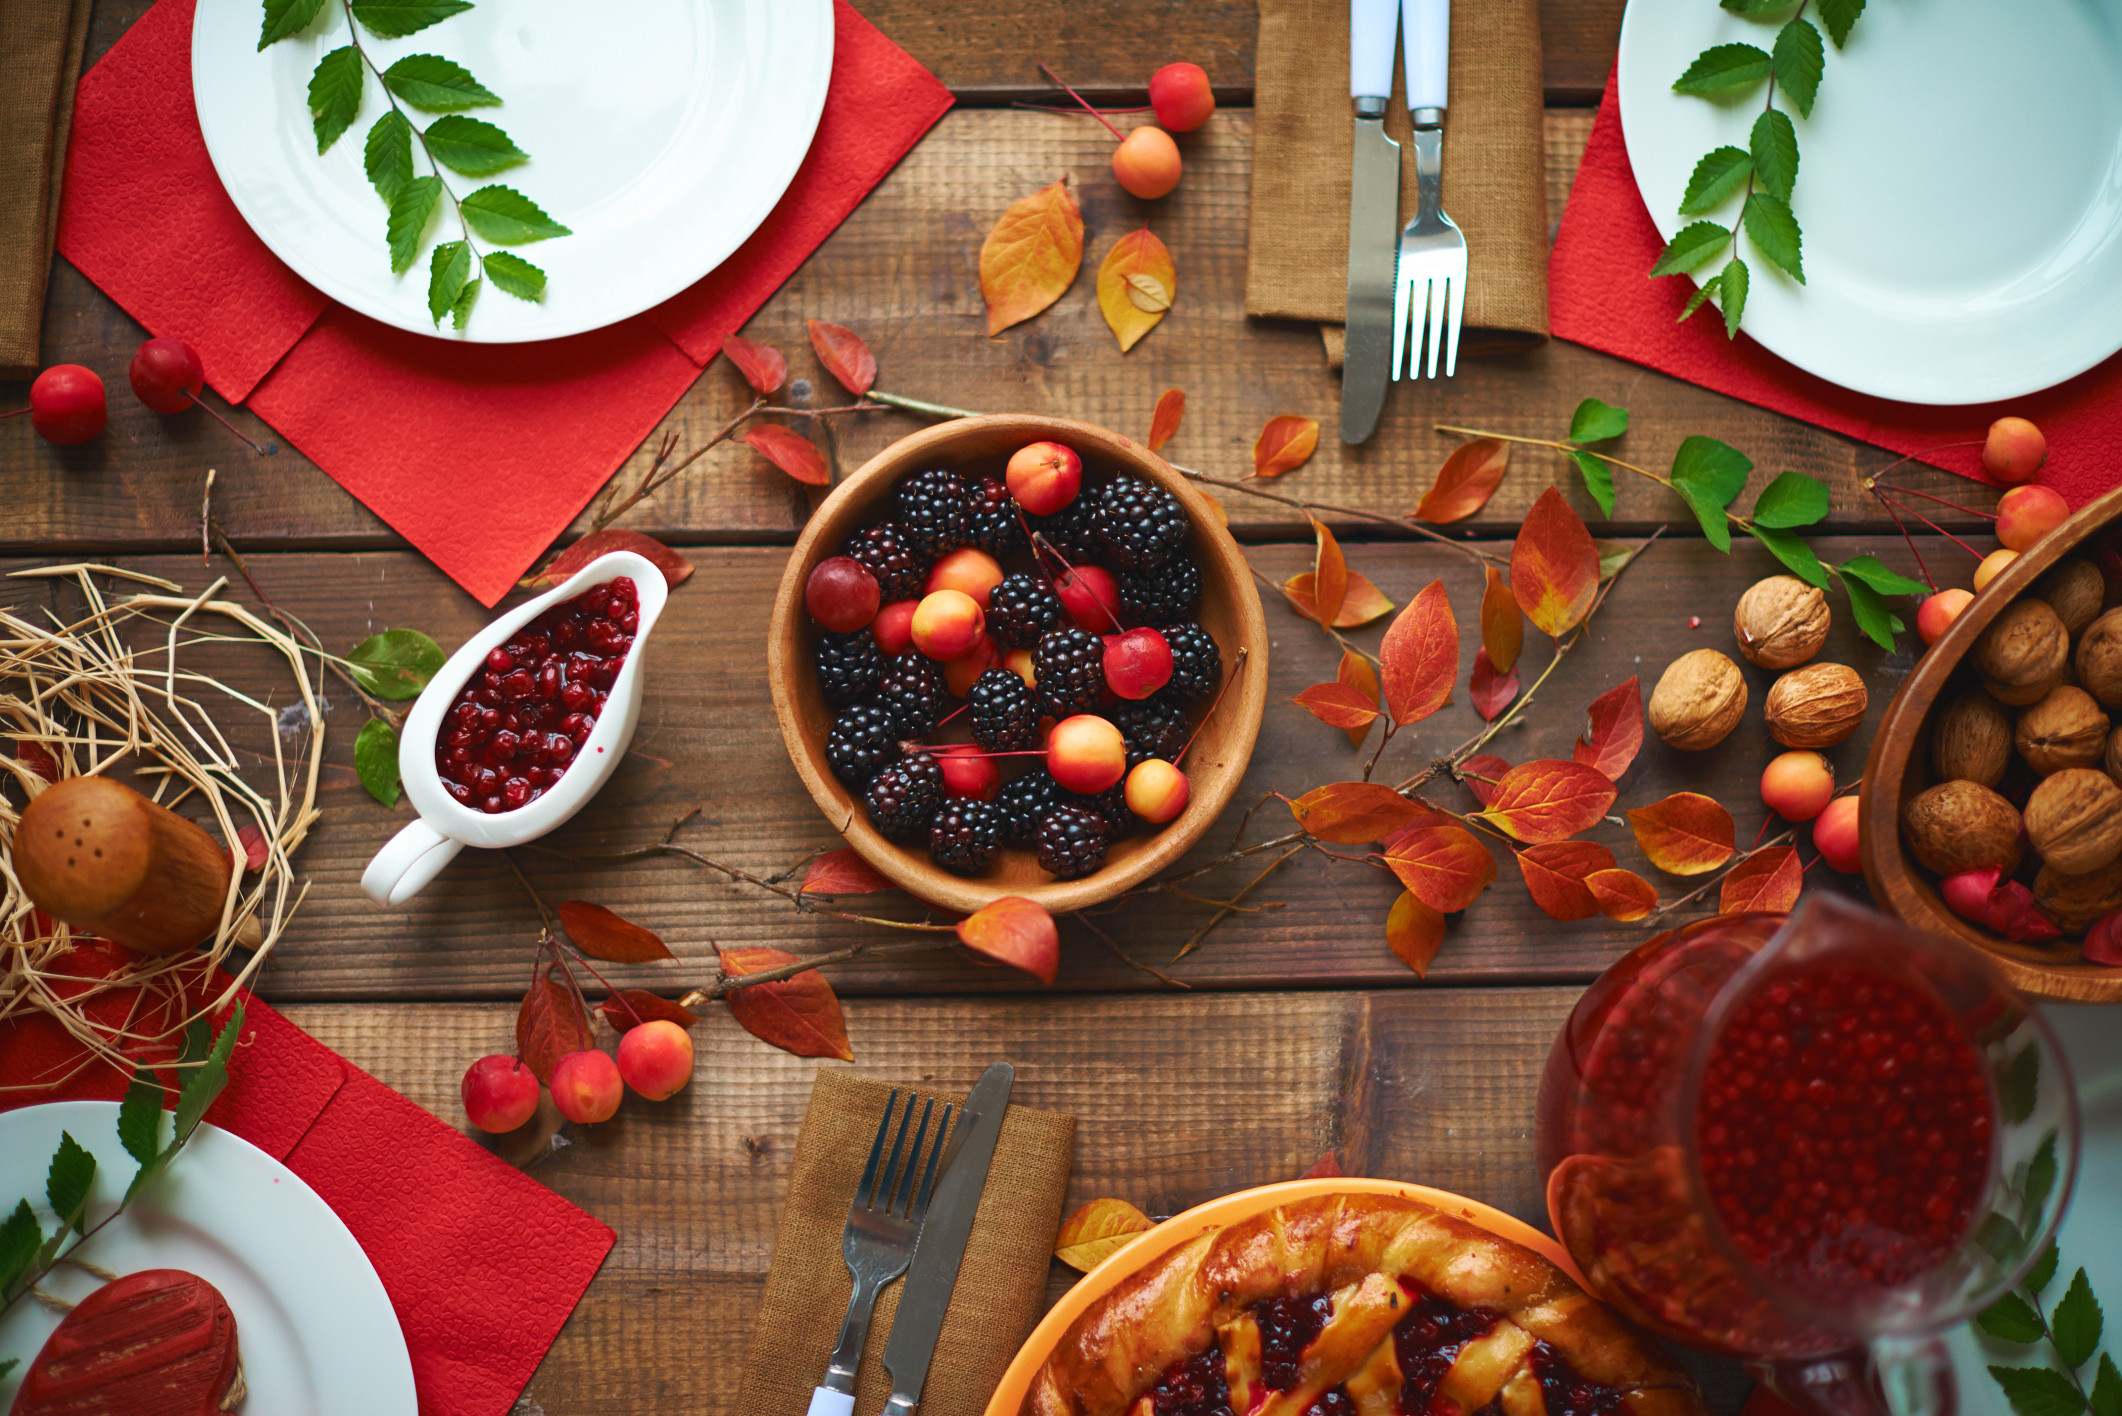 Non Traditional Thanksgiving Dinner Ideas  6 Ideas for a Non Traditional Thanksgiving Dinner